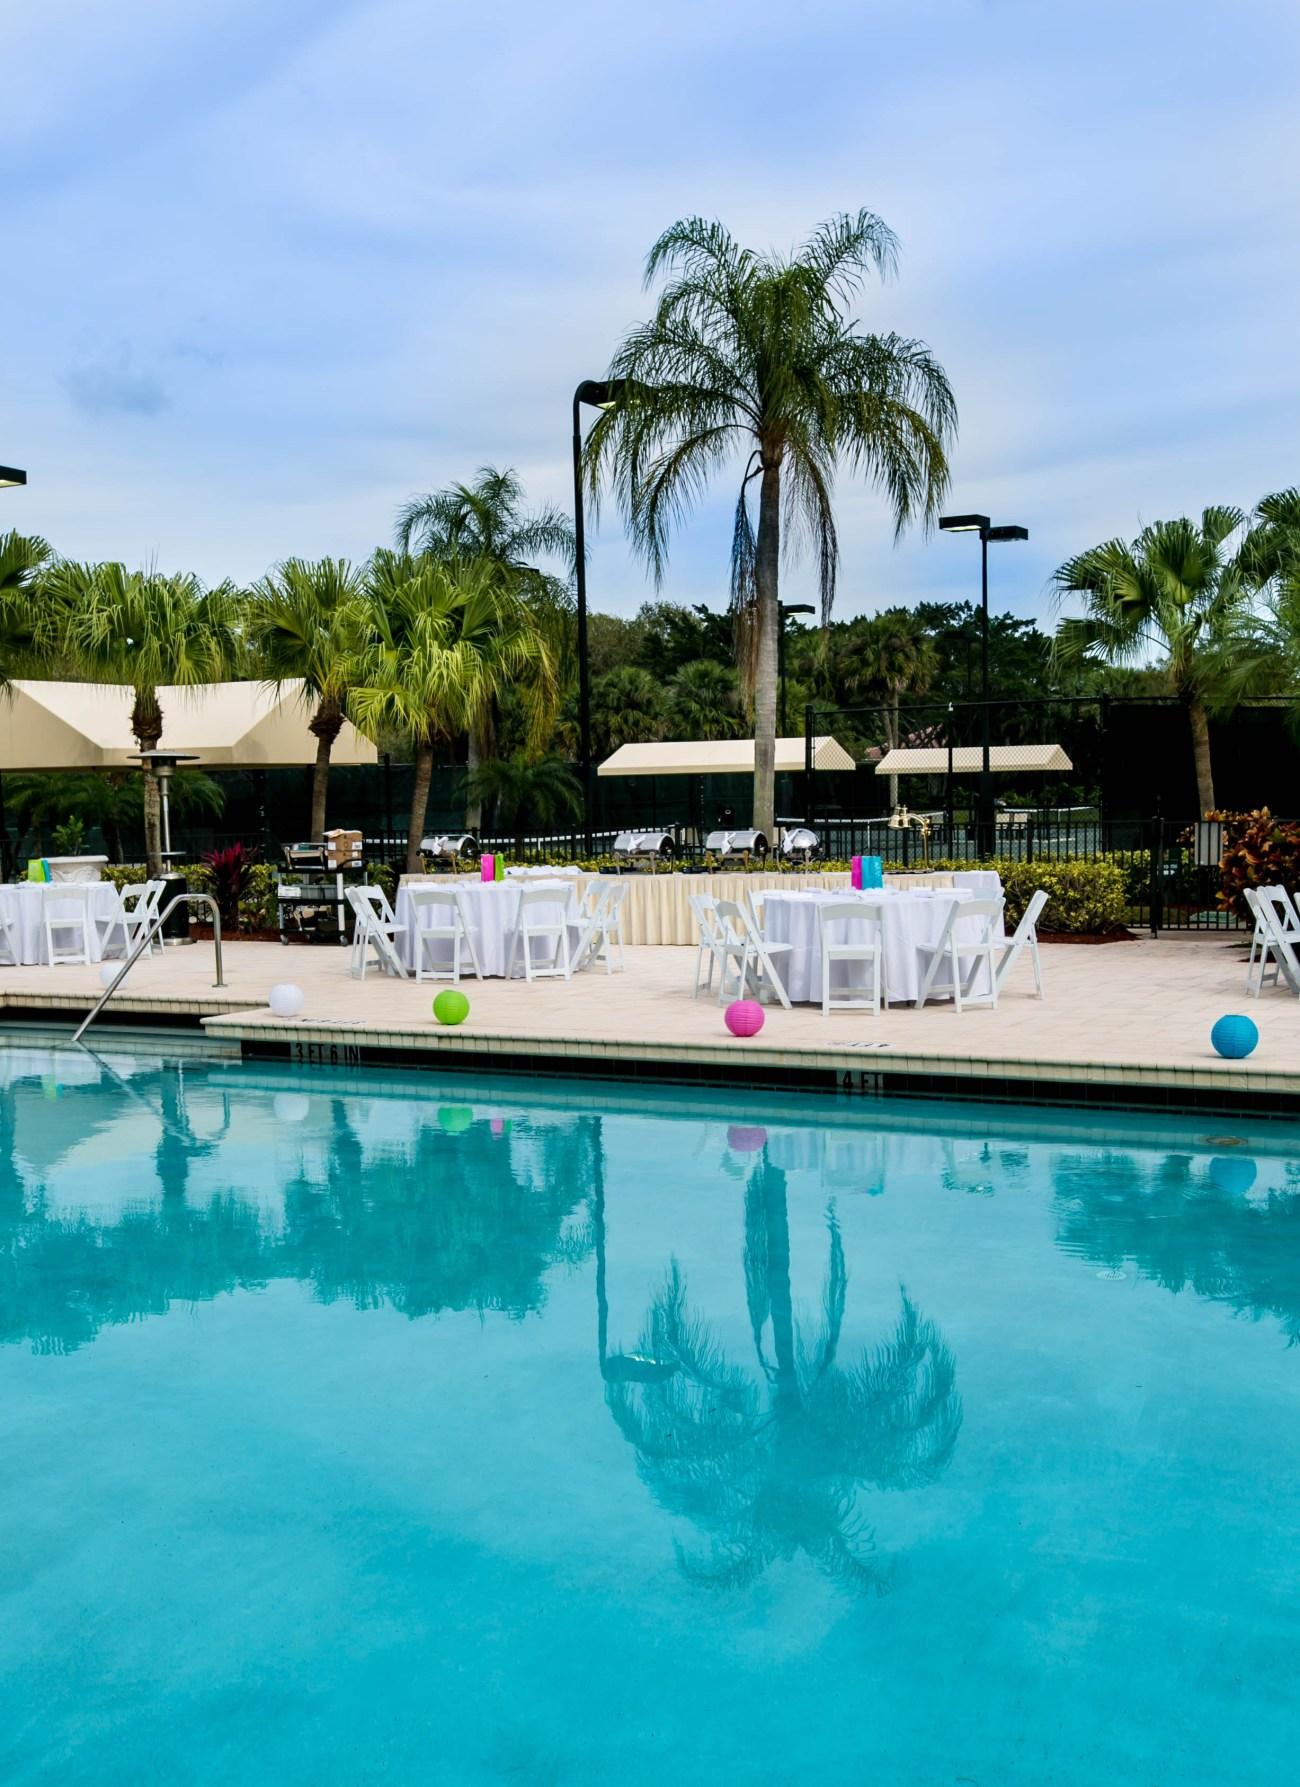 COUNTRY CLUB IN LAKE CLARKE SHORES FLORIDA - preserveatironhorse.com/